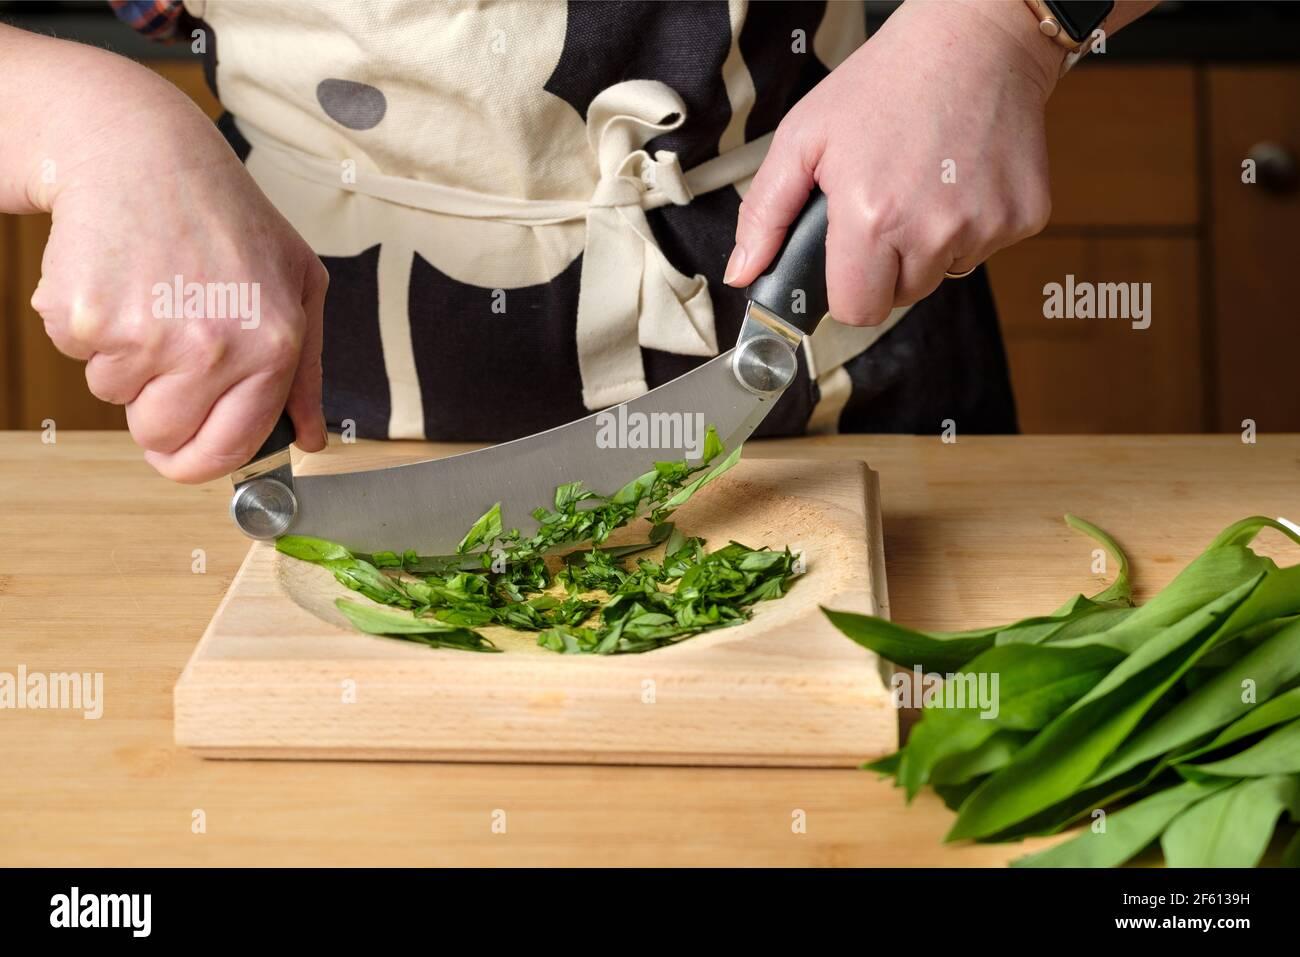 a-cook-chops-freshly-picked-wild-garlic-